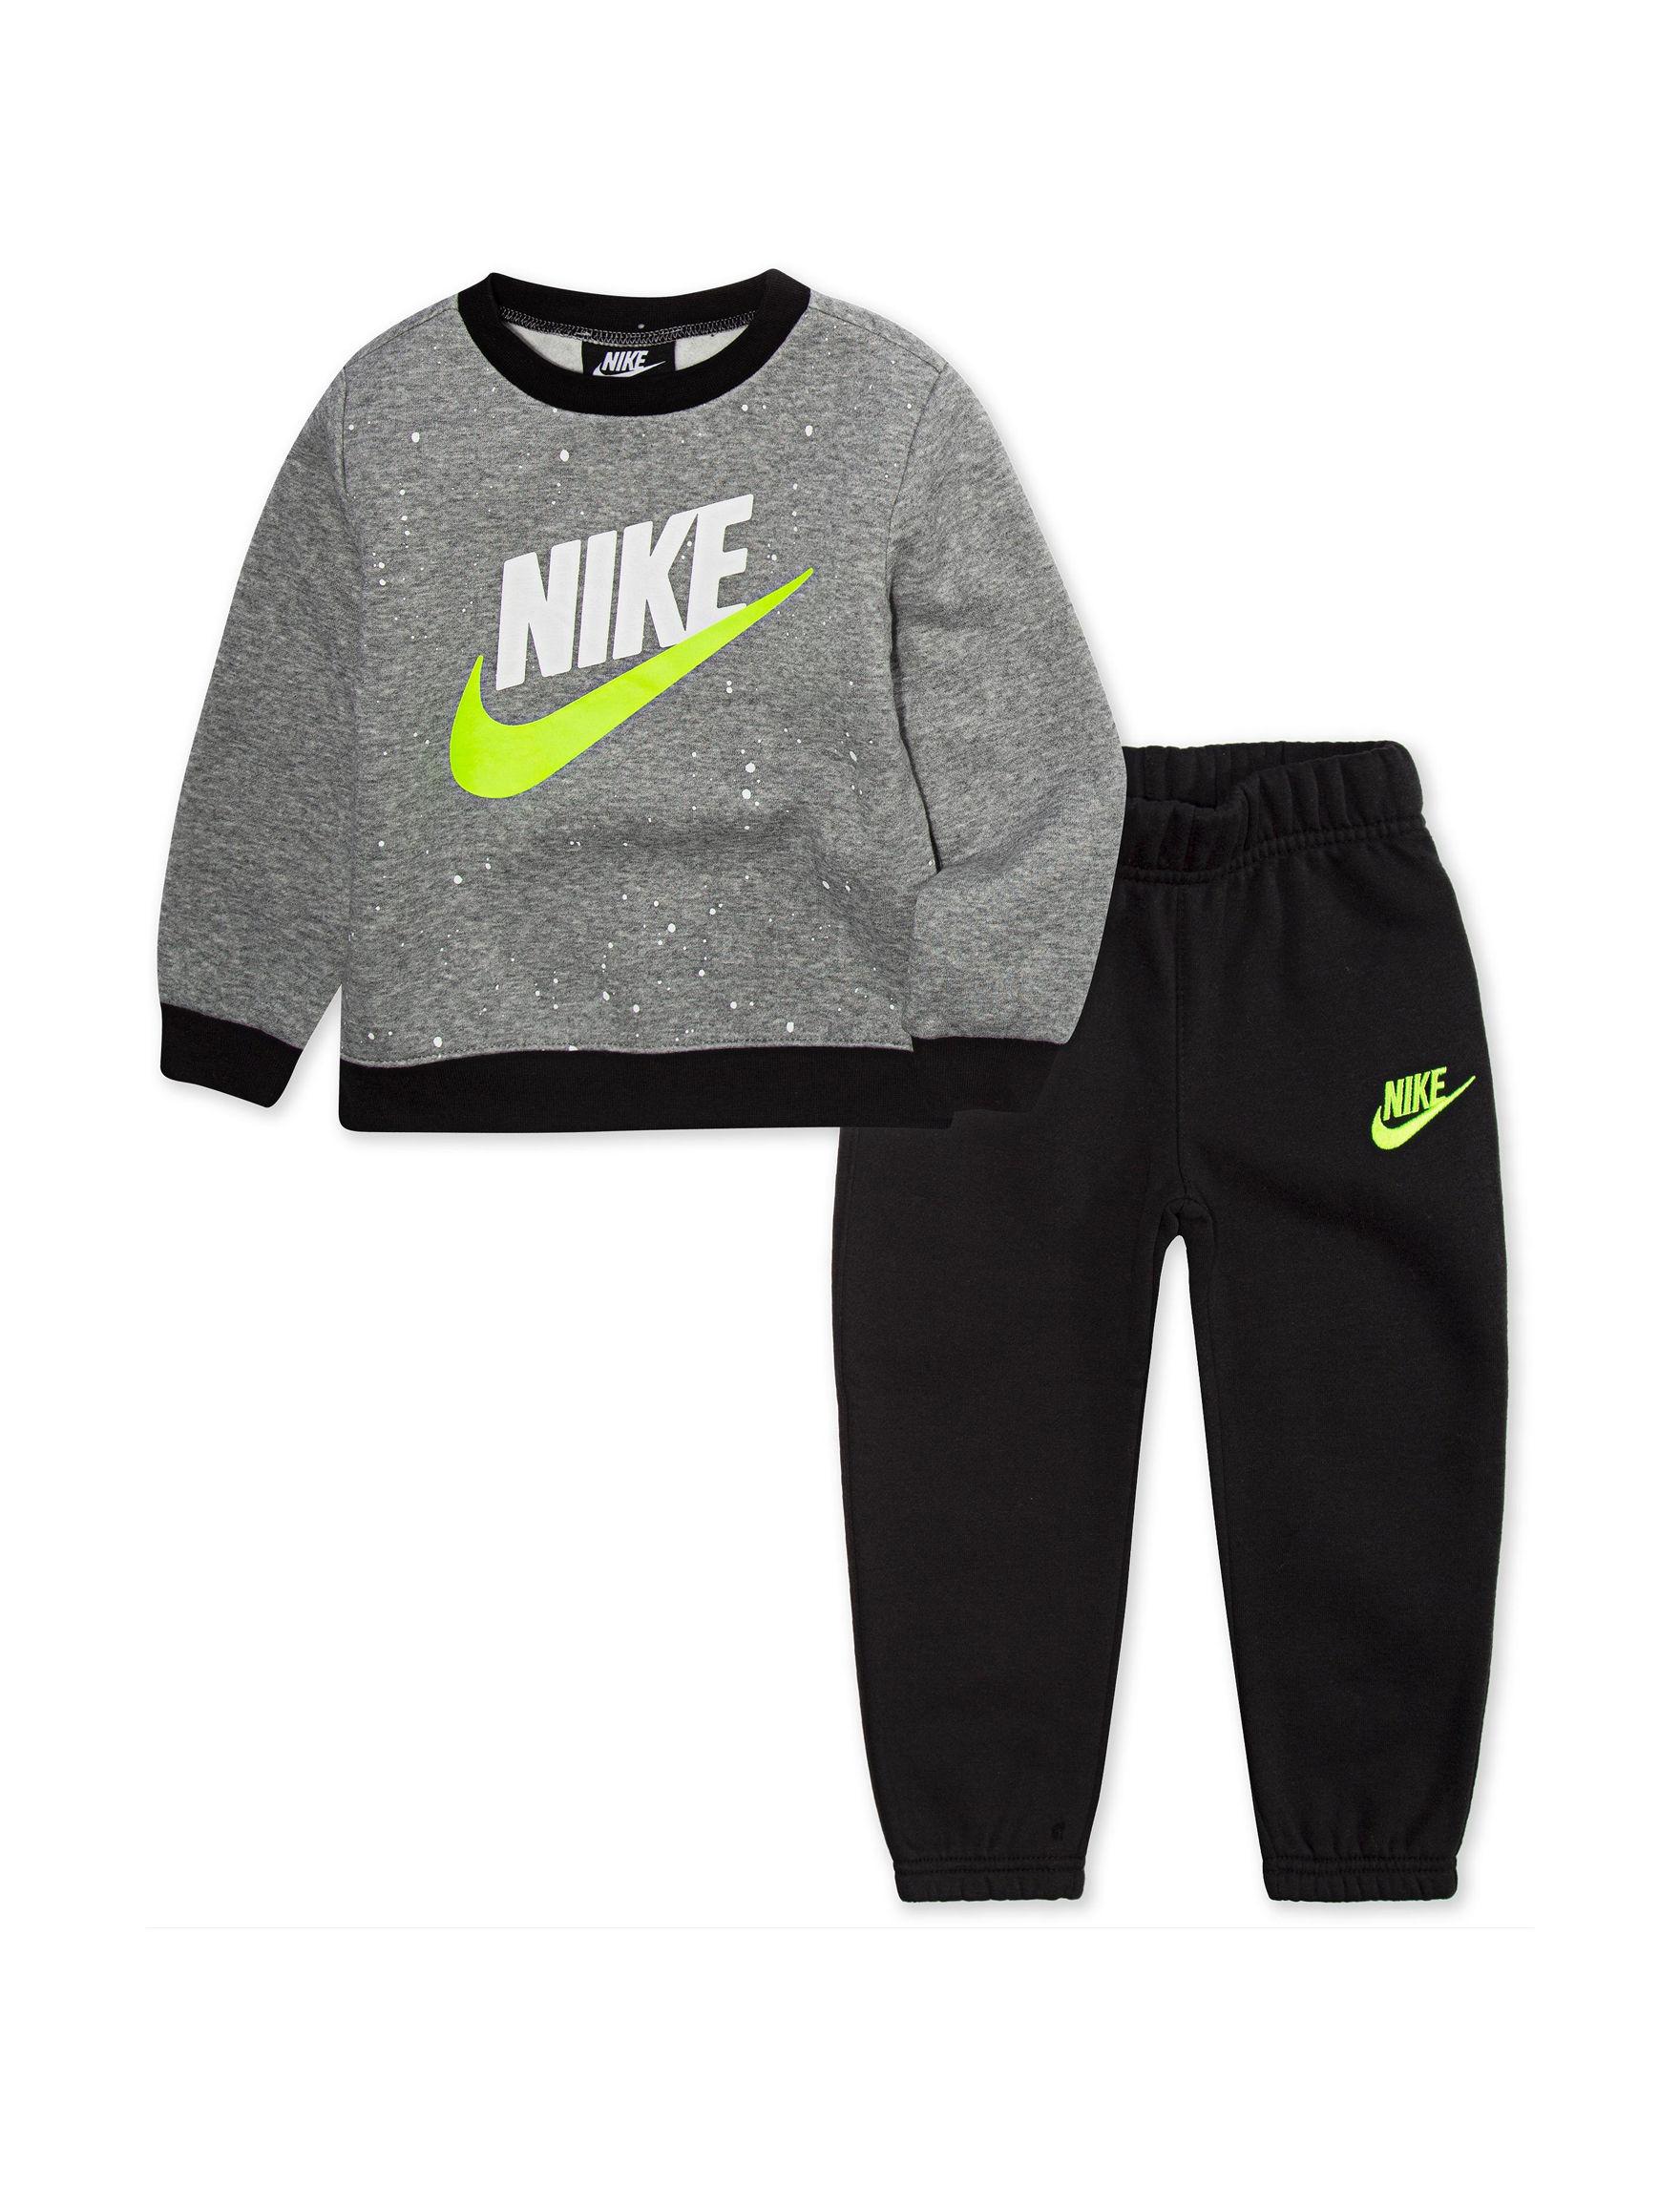 431f6e4b069 Nike 2-pc. Speckled Futura Joggers Set - Toddlers   Boys 5-7